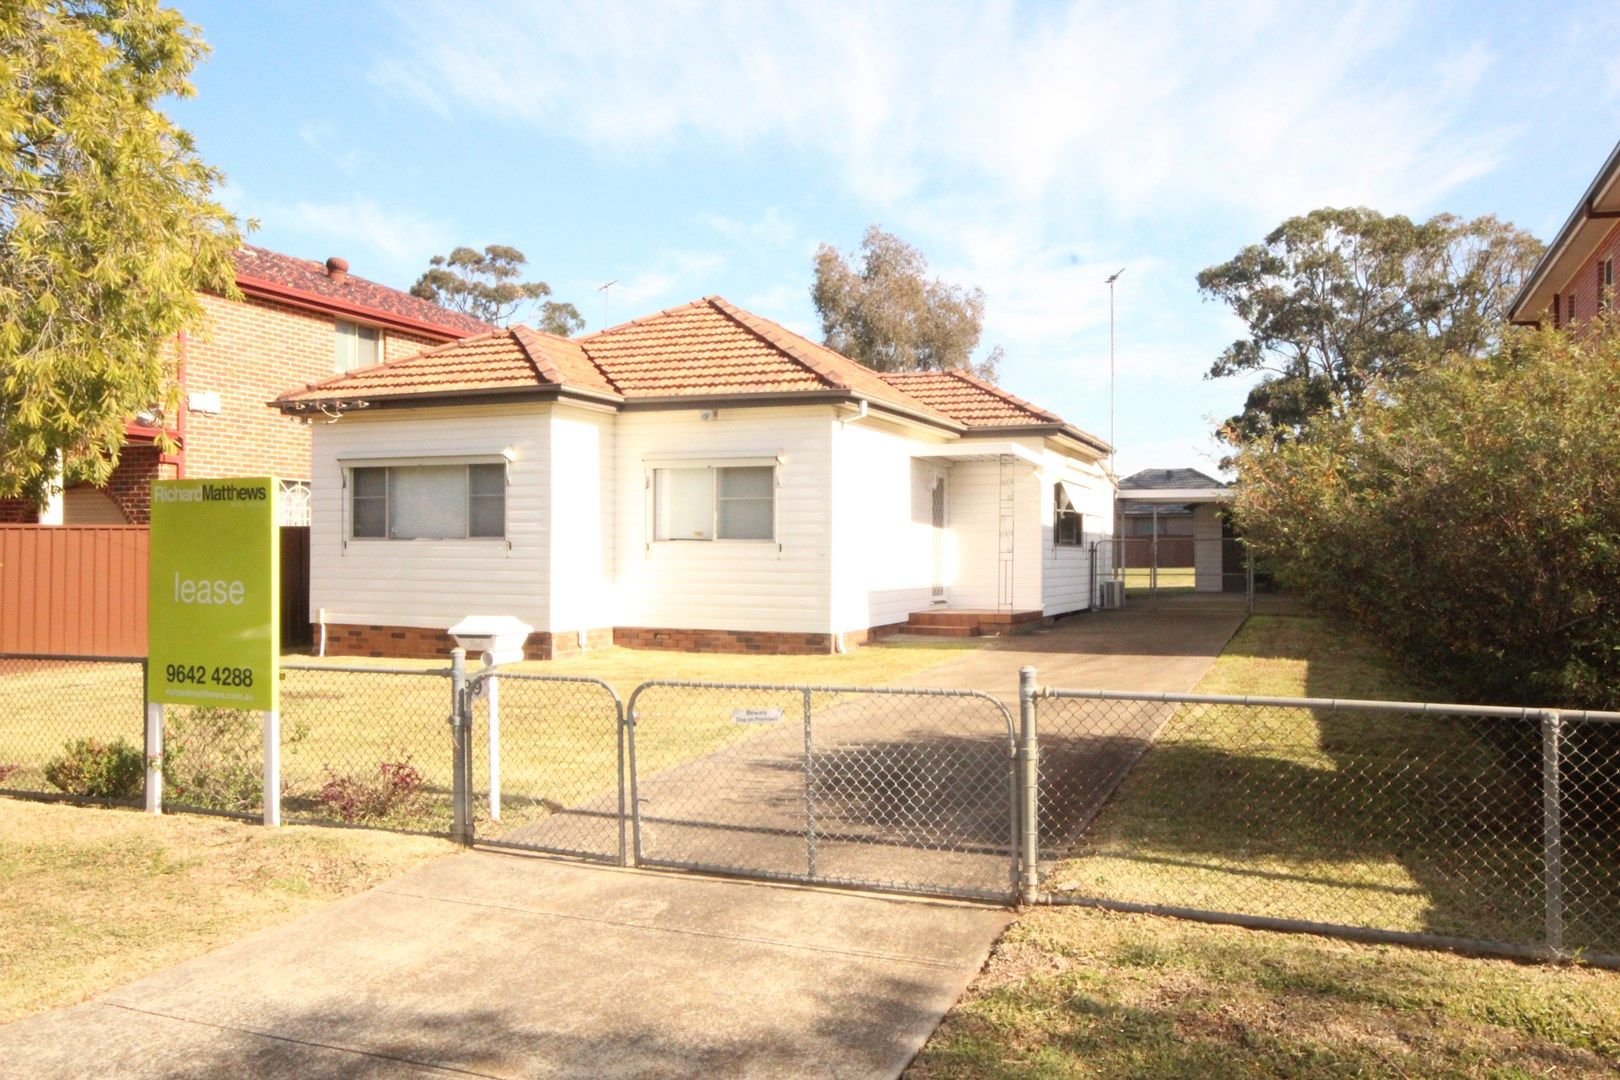 99 Oxford Avenue, Bankstown NSW 2200, Image 0